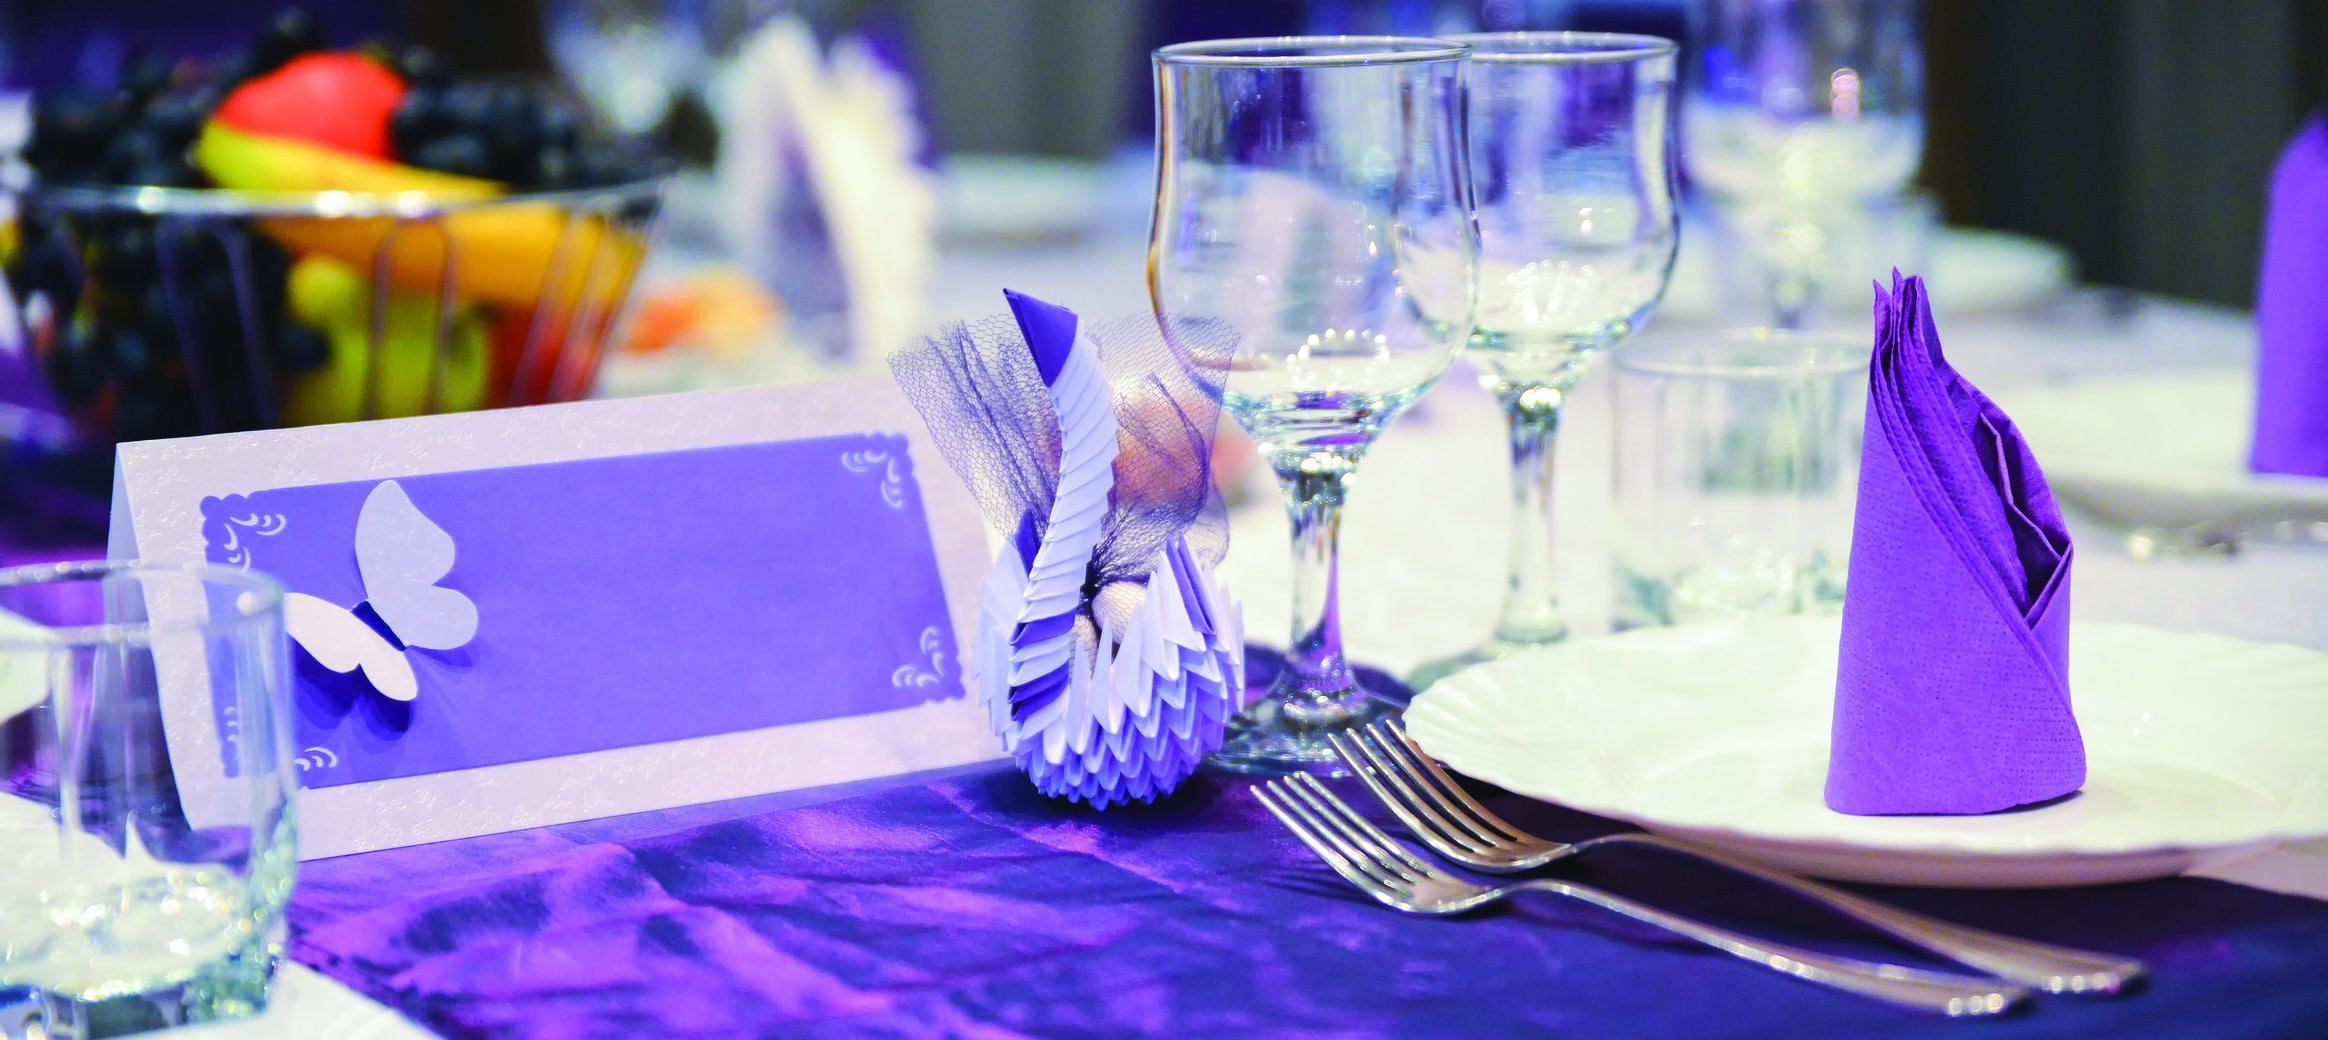 Un repas caritatif et conviviale